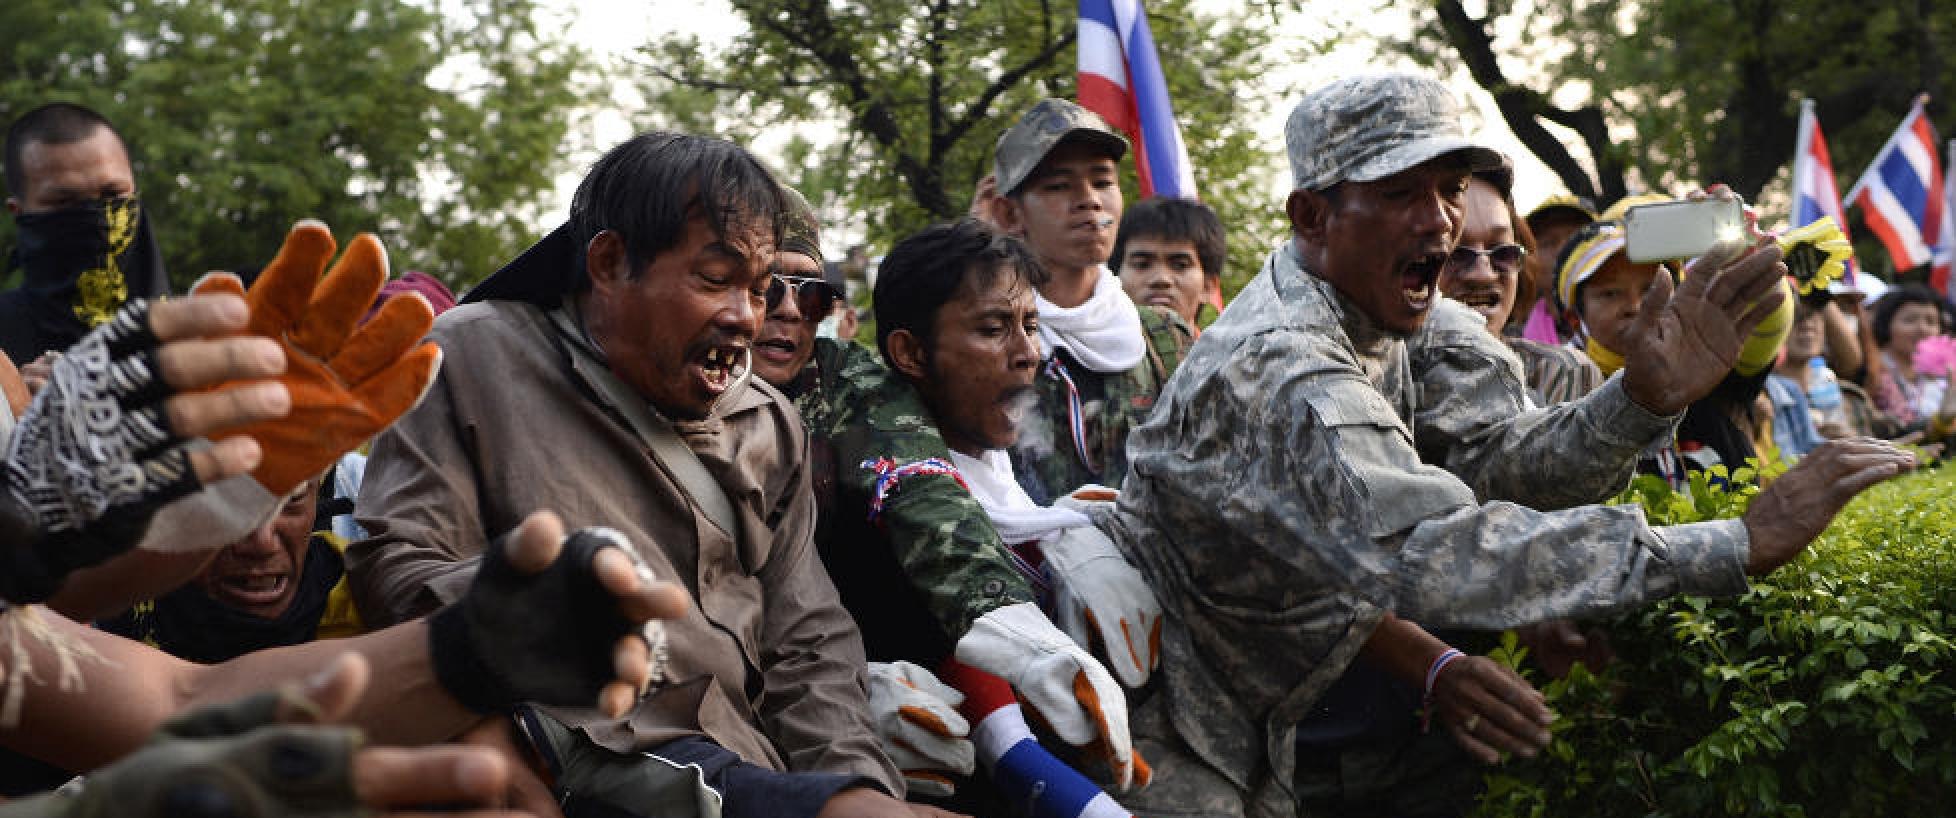 nyheter online thailand